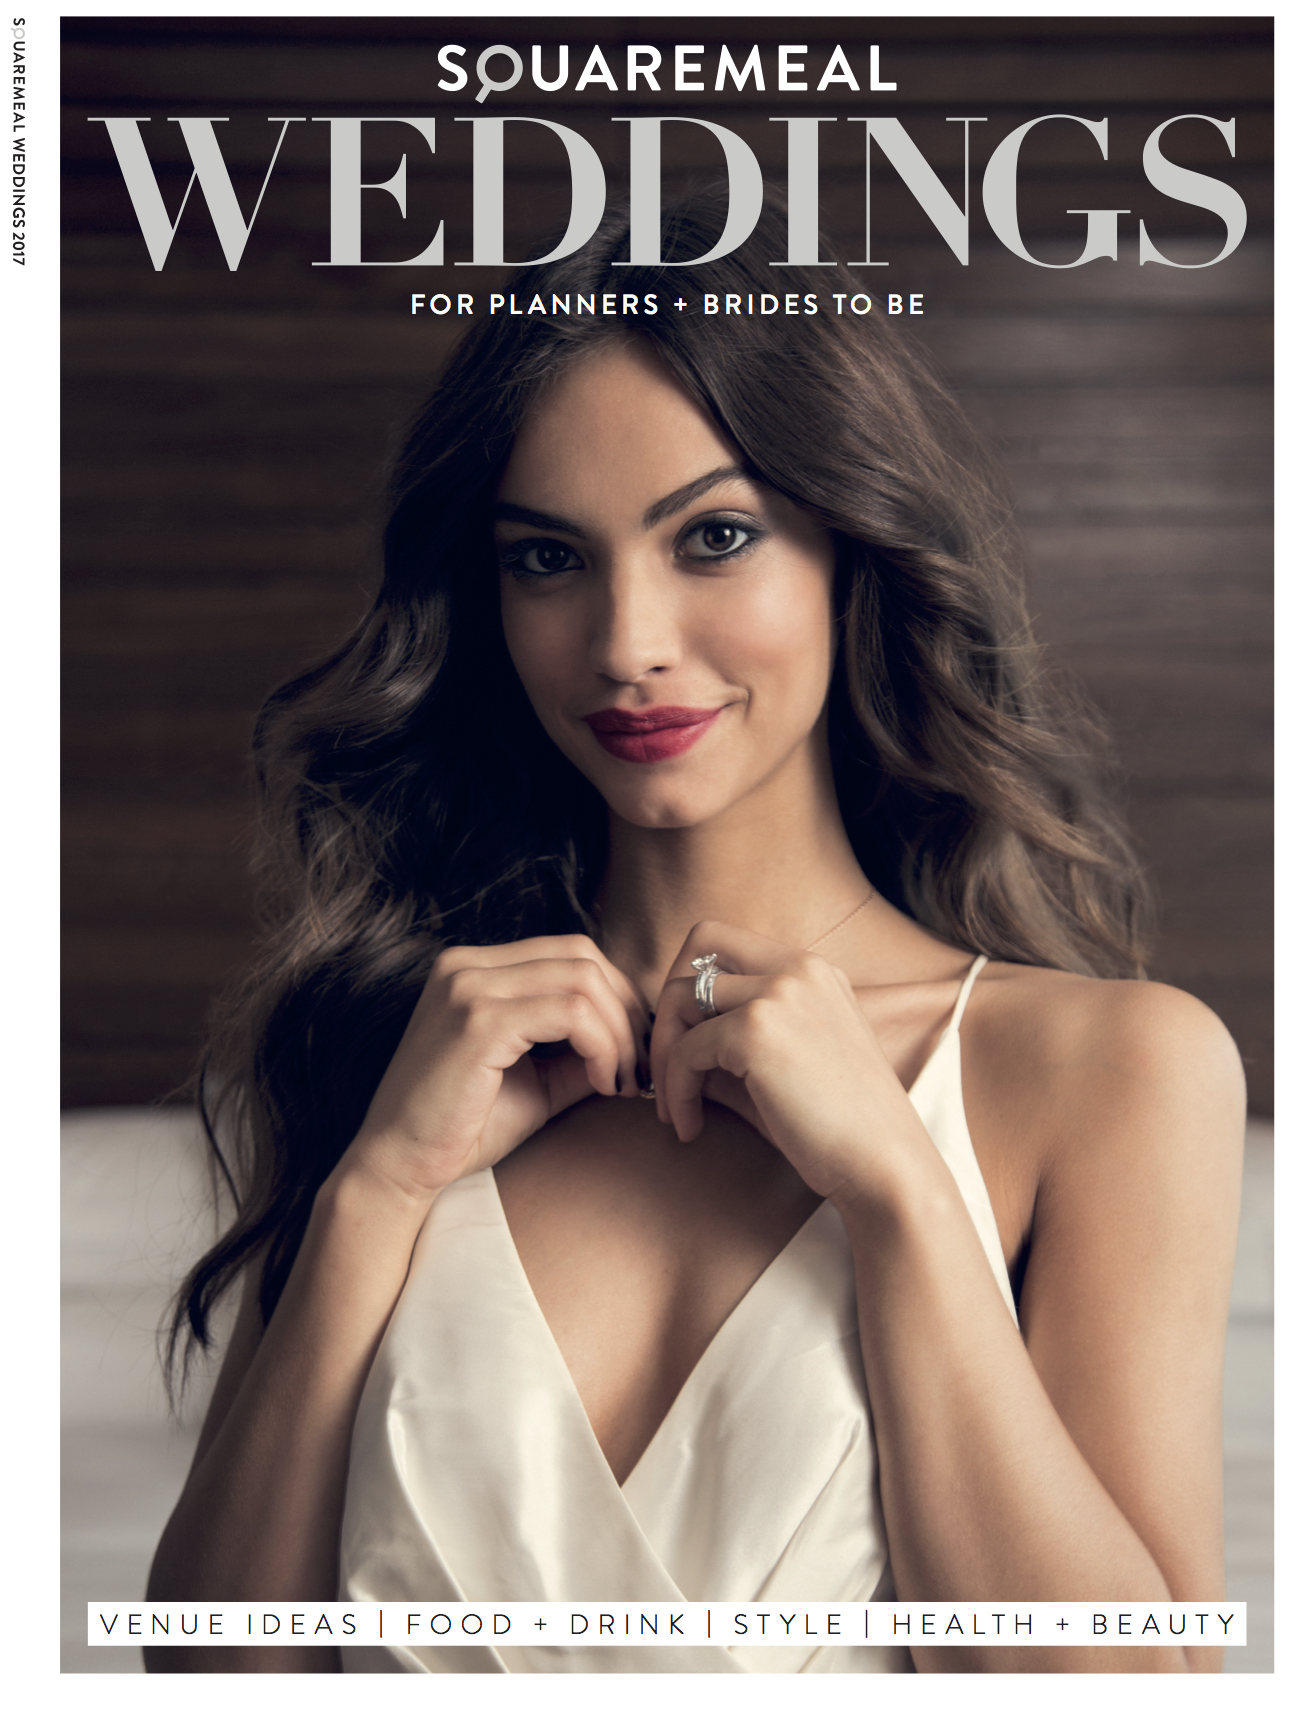 cover SquareMeal Weddings 2017 magazine_cover.jpg